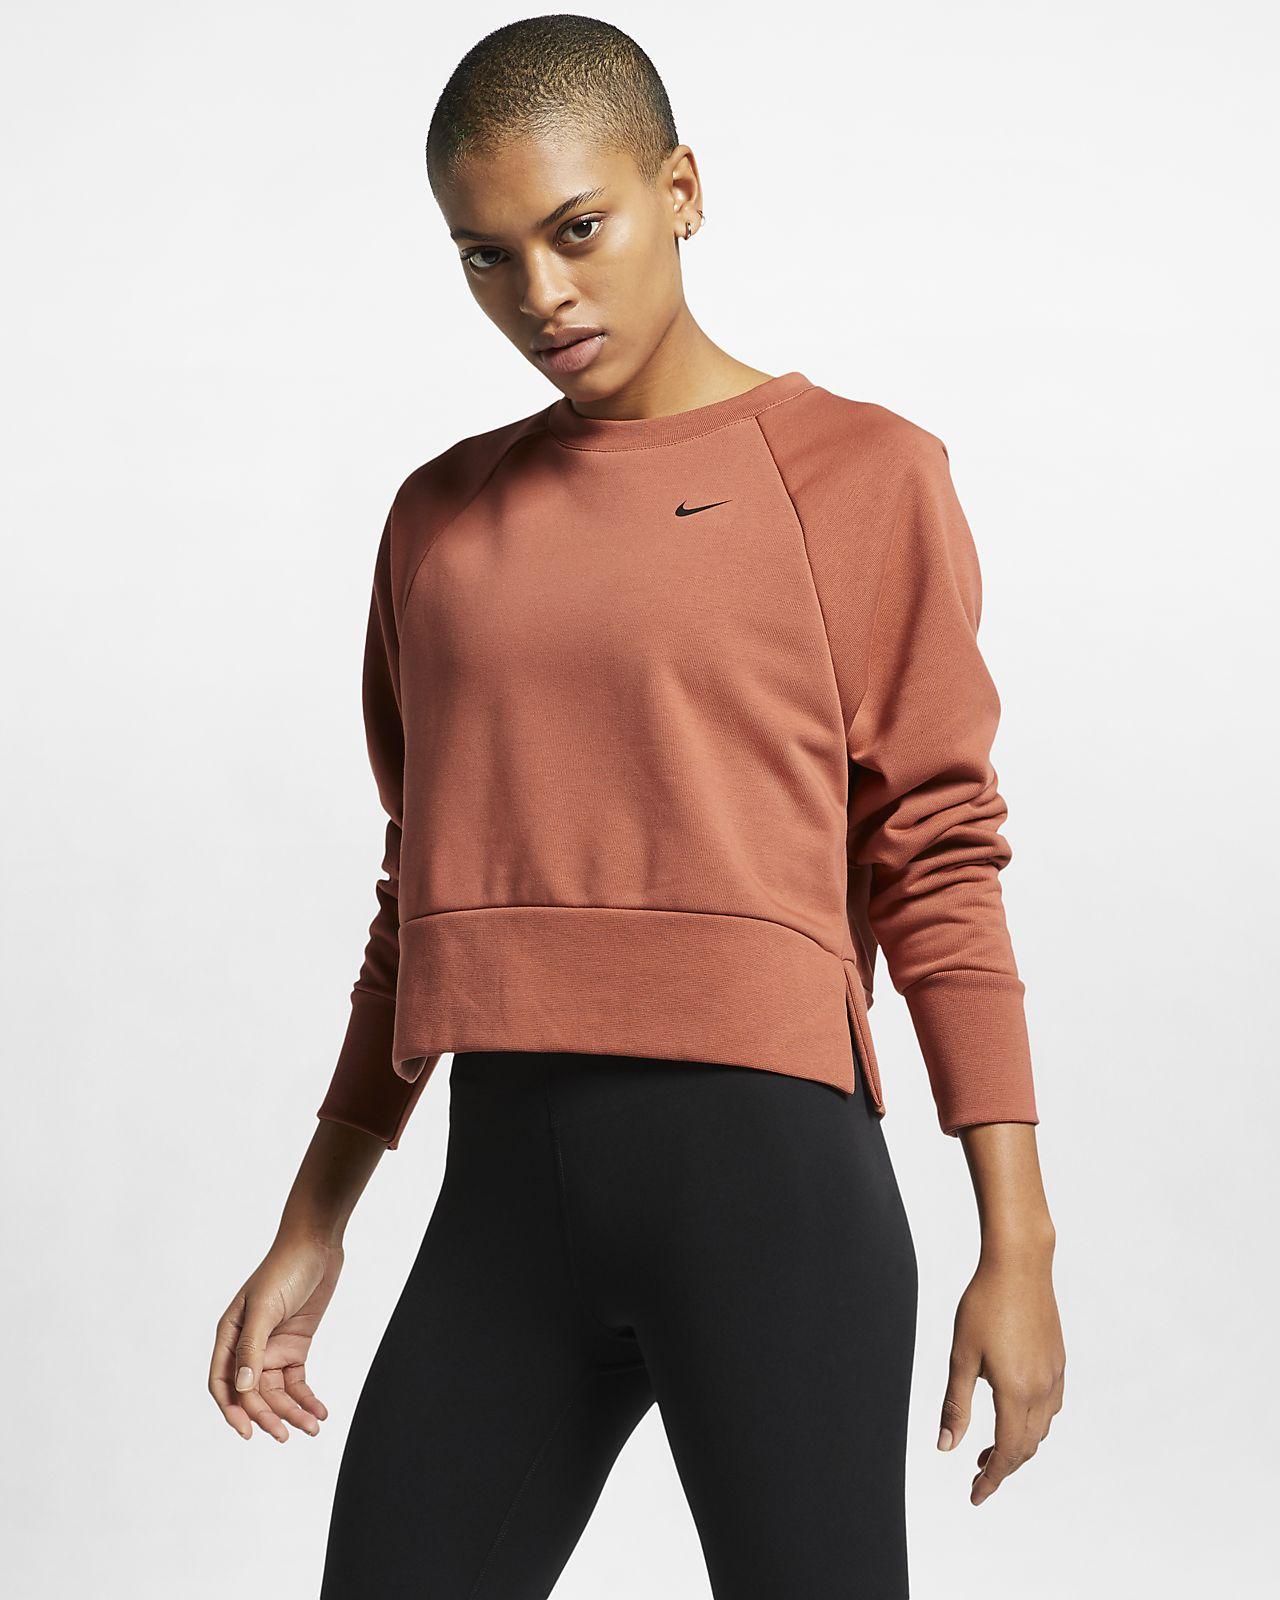 5cf28a4eea403 Nike Dri-FIT Women's Long-Sleeve Yoga Training Top. Nike.com CH